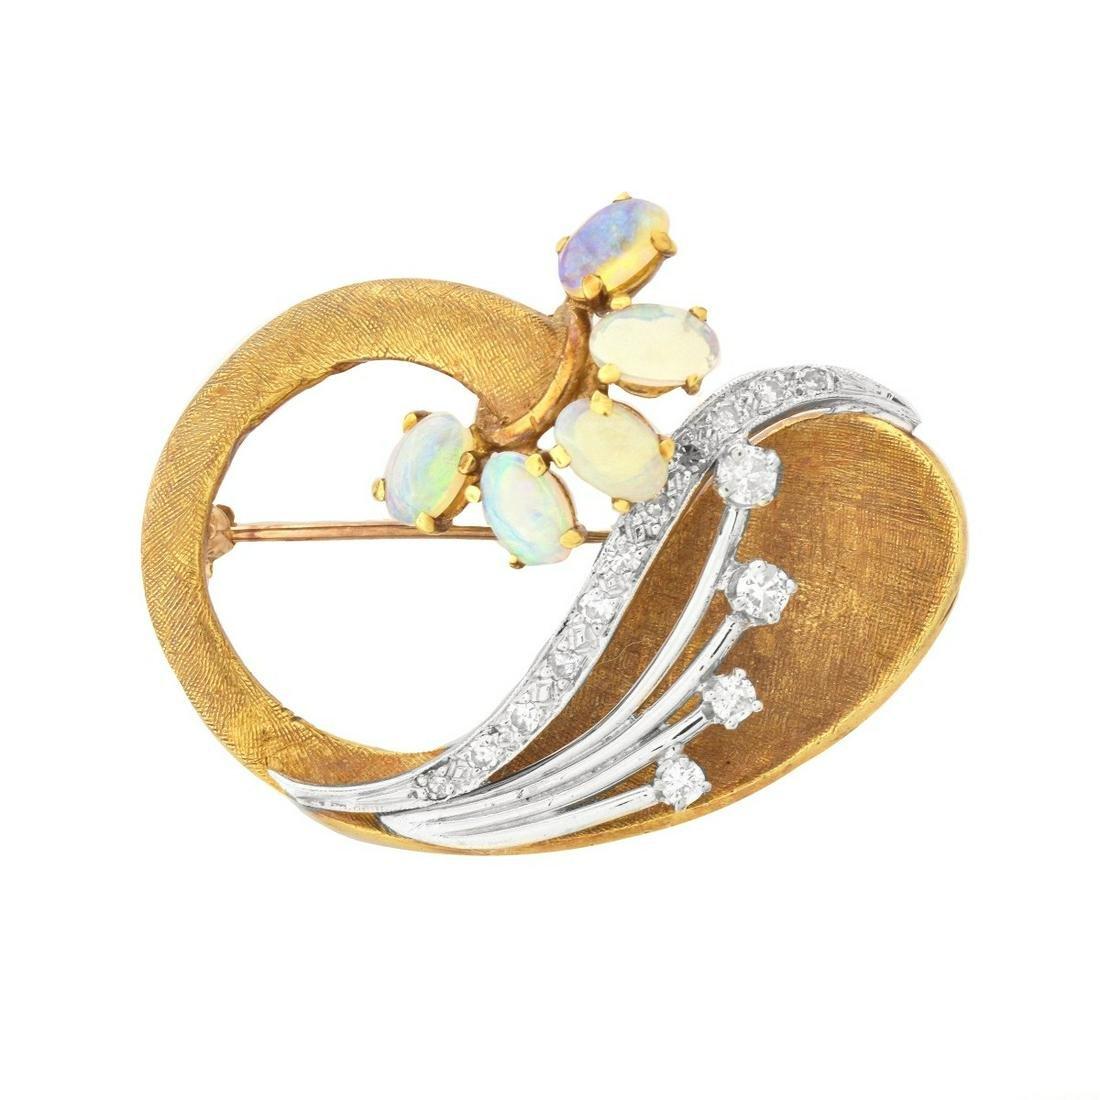 Vintage Diamond, Opal and 18K Brooch